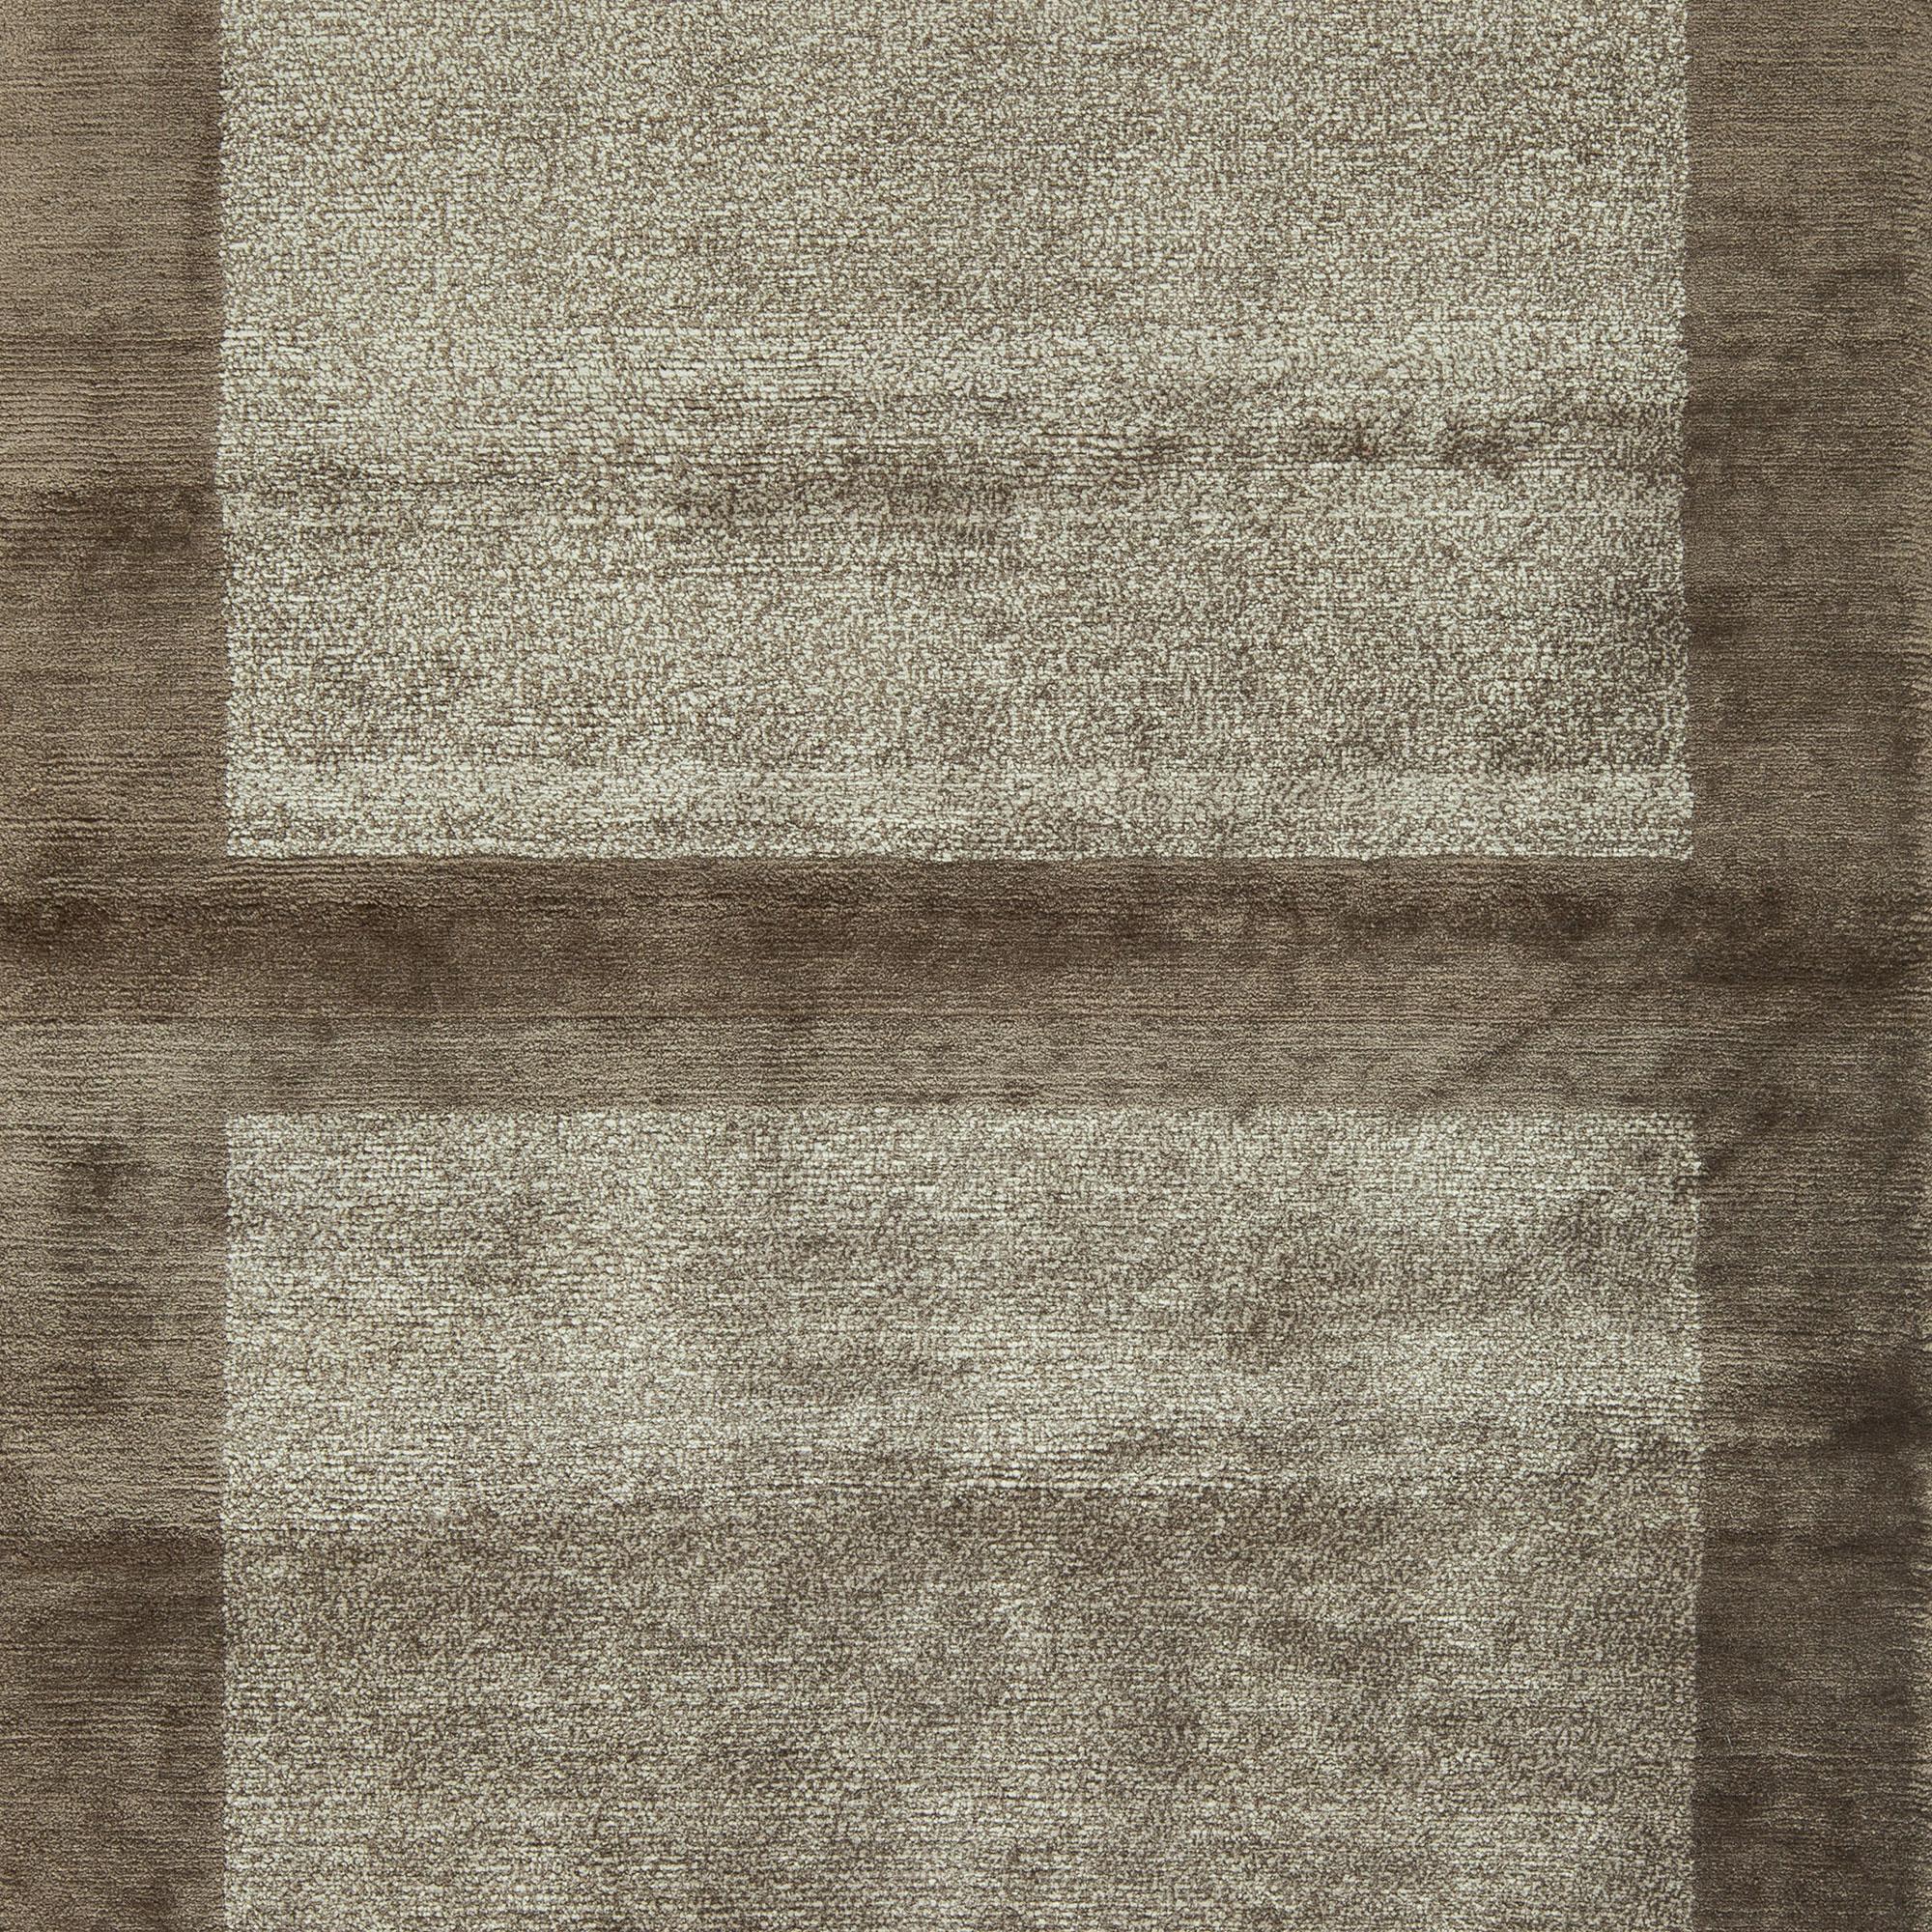 Tweed Custom Rug Design S11790 S11790